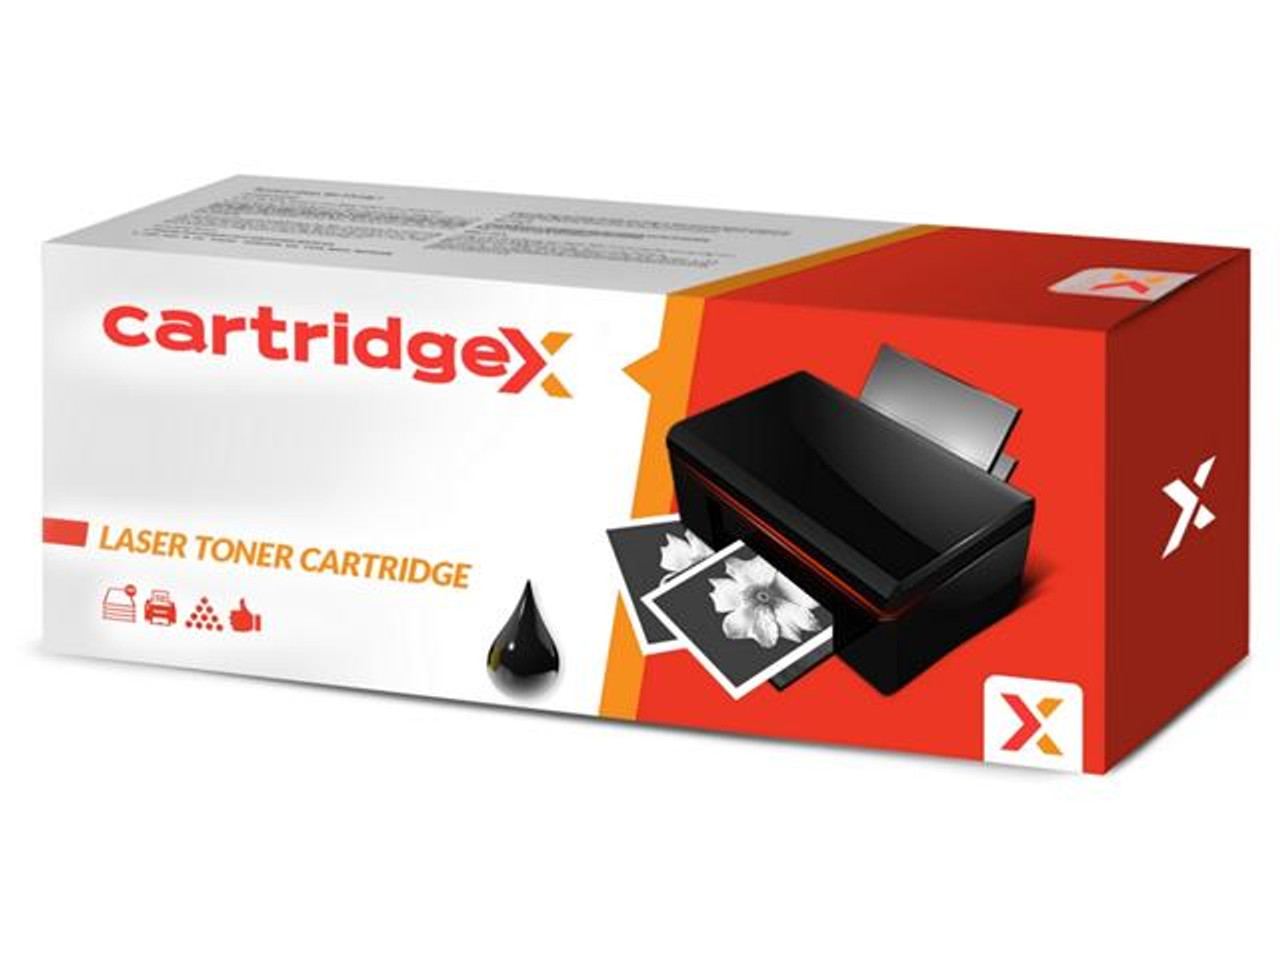 Compatible Samsung Ml-1520d3 Black Toner Cartridge